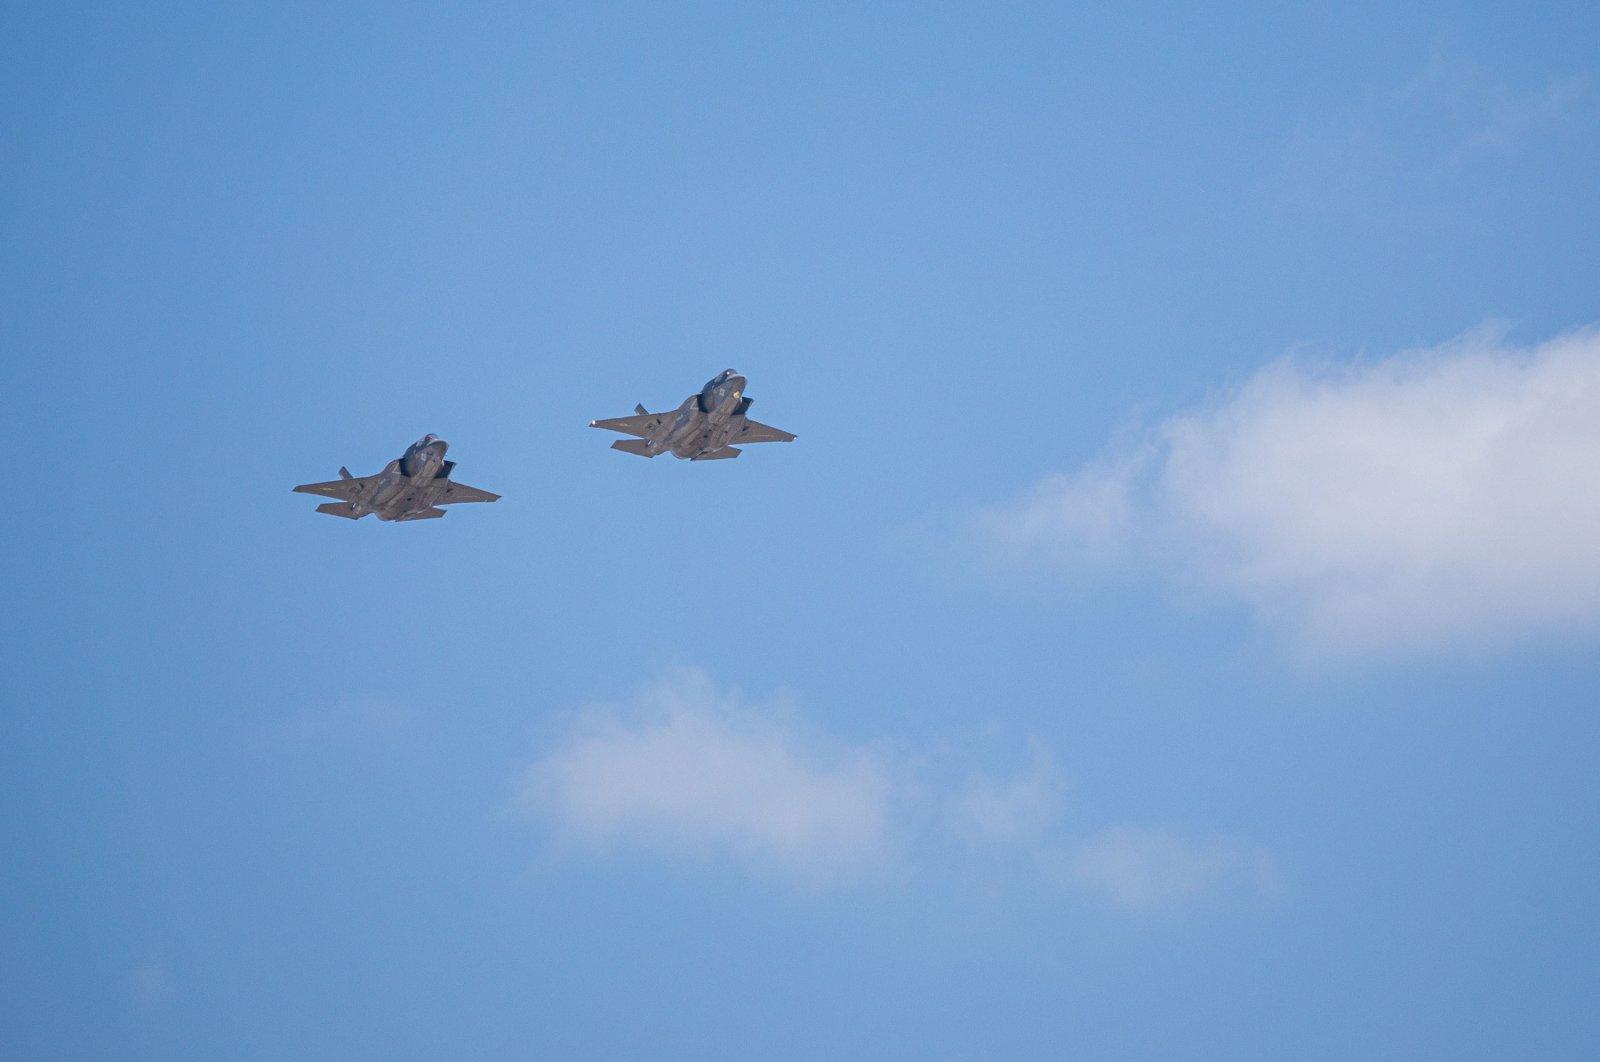 Two F35B jets seen during the Miramar 2019 Air Show, Miramar, California, U.S., Sept. 29, 2019. (Shutterstock Photo)